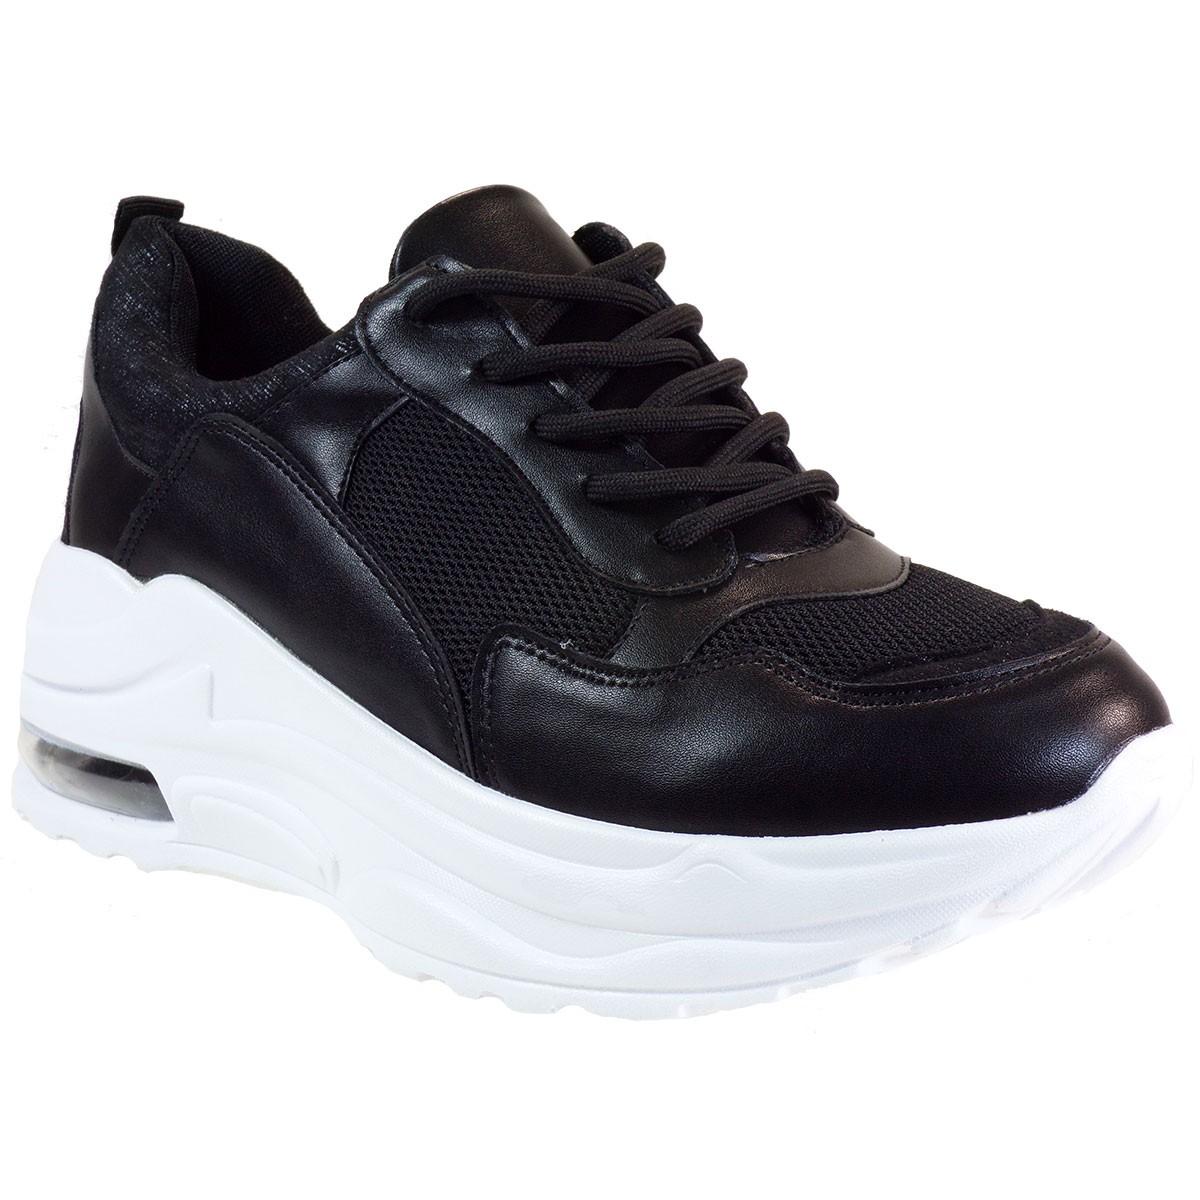 Bagiota Shoes Γυναικεία Παπούτσια Sneakers Αθλητικά Α2 Μαύρο